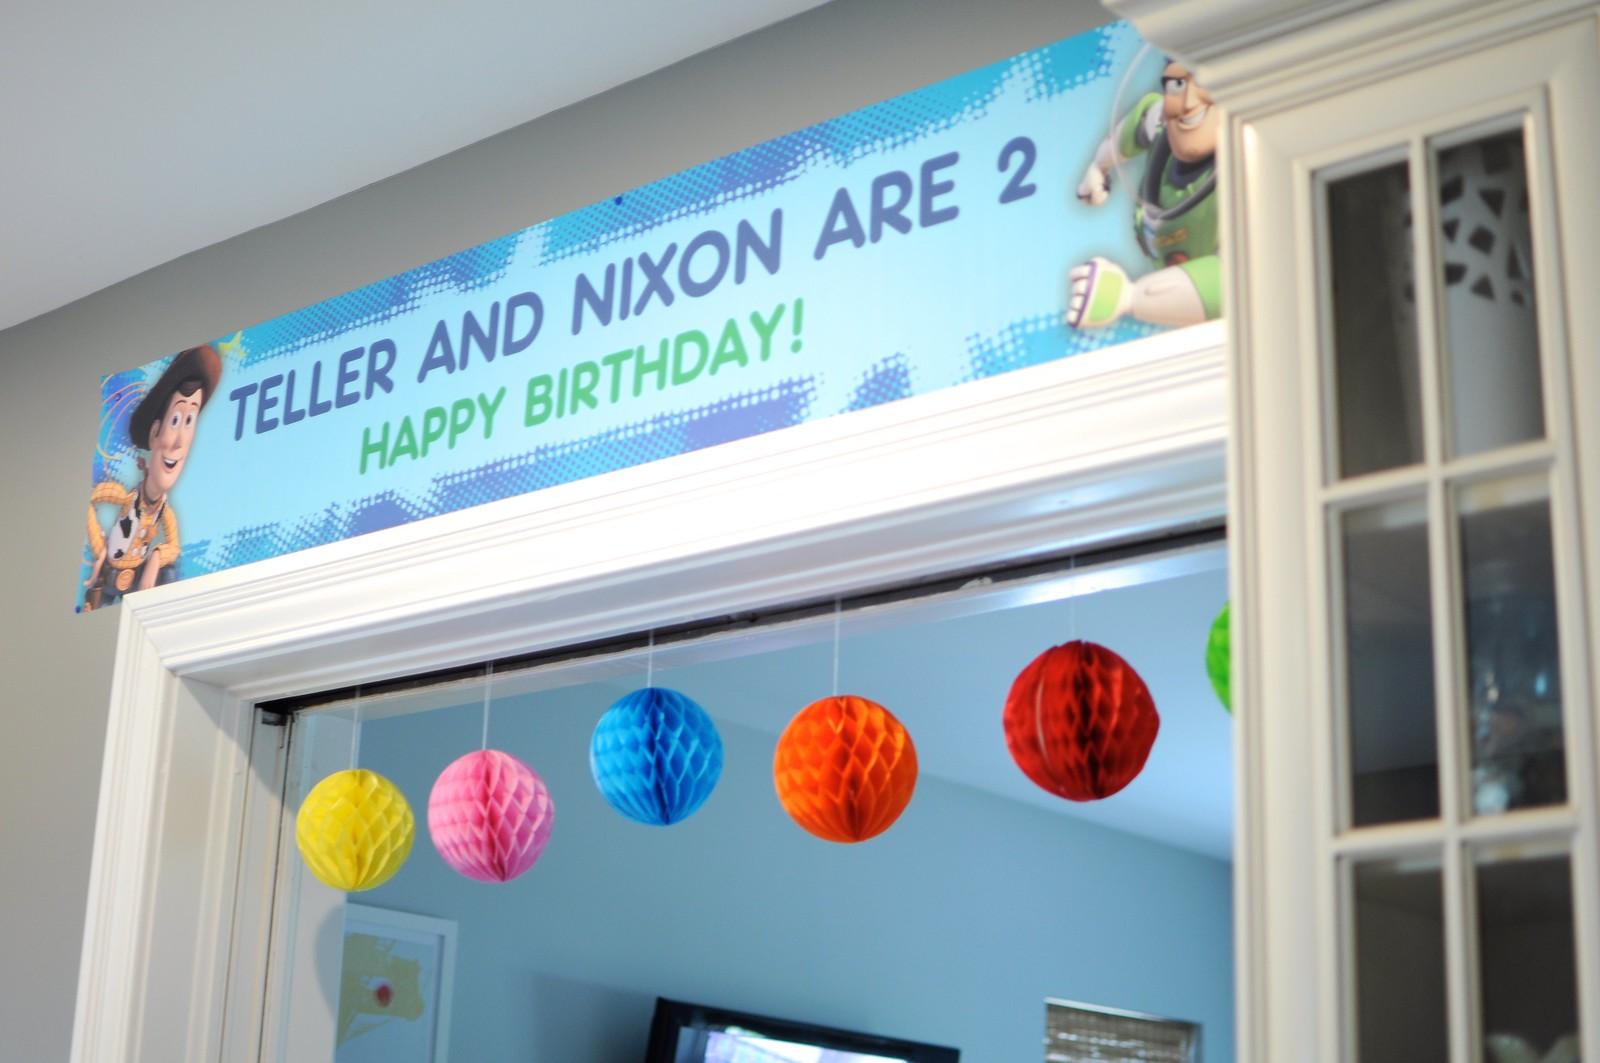 Teller and Nixon 2 Year Update